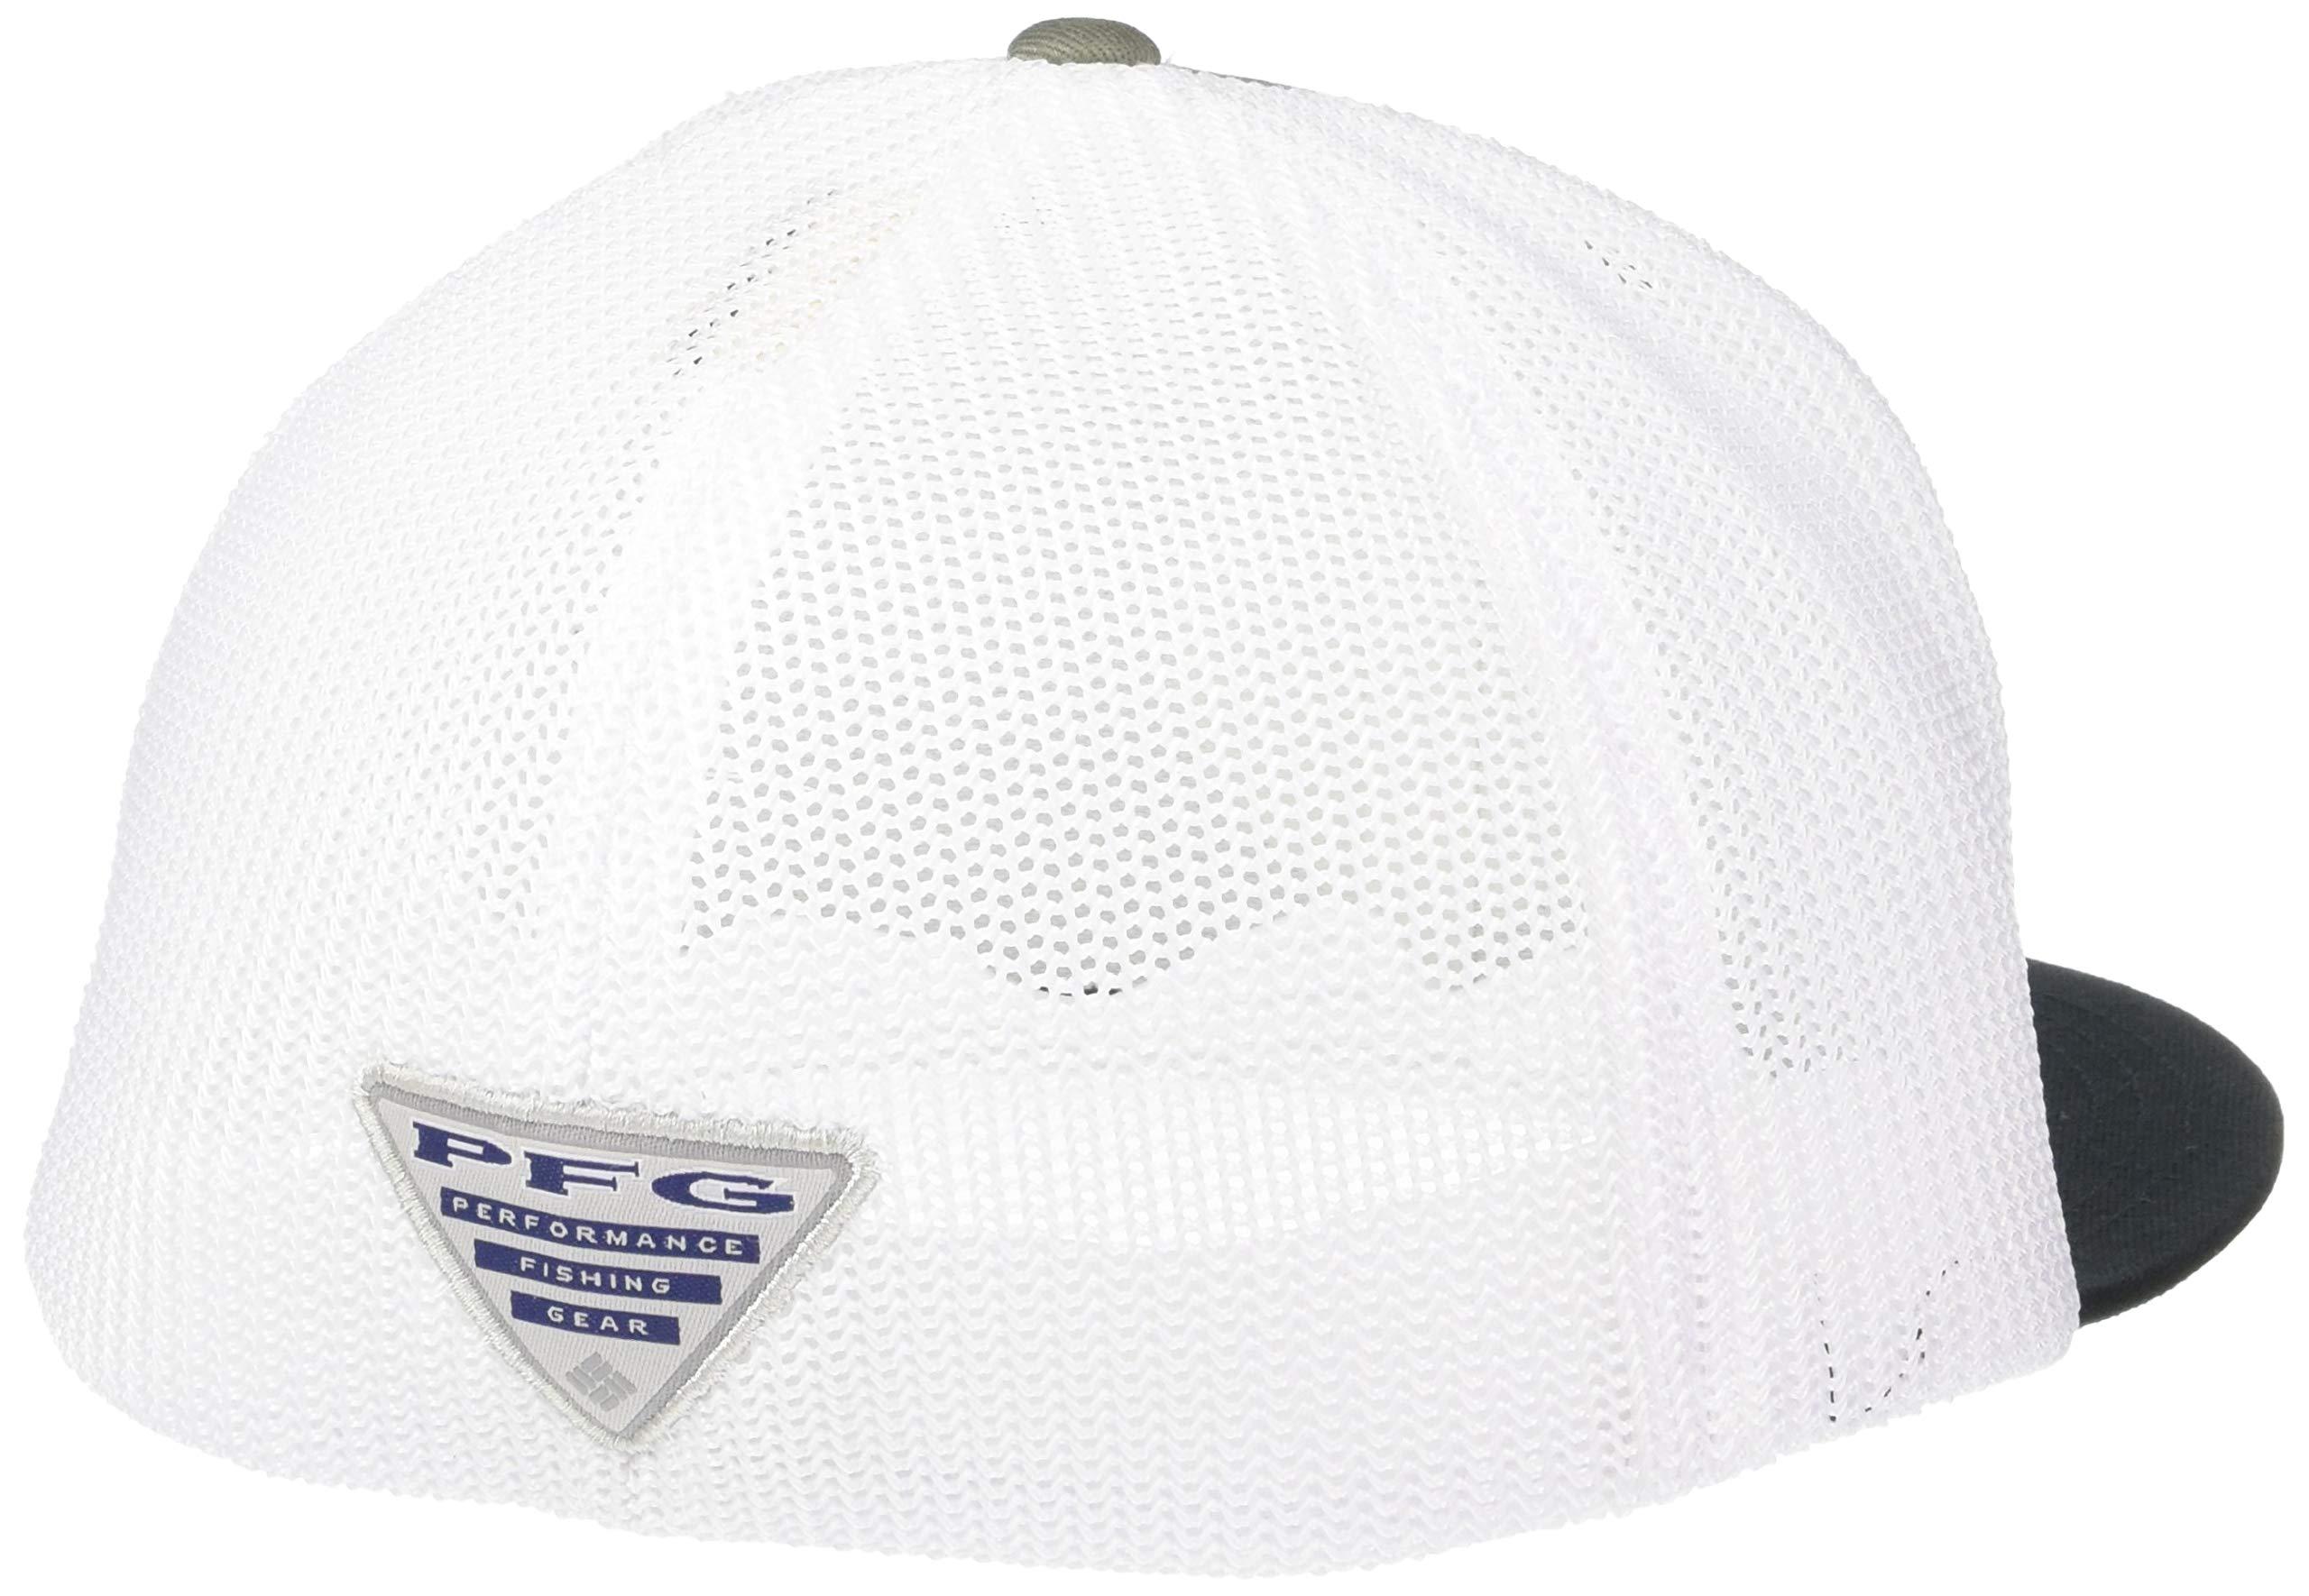 8f48c06697309 Columbia PFG Mesh Flat Brim Ball Cap   Outdoor Clothing   Sports   Outdoors  - tibs